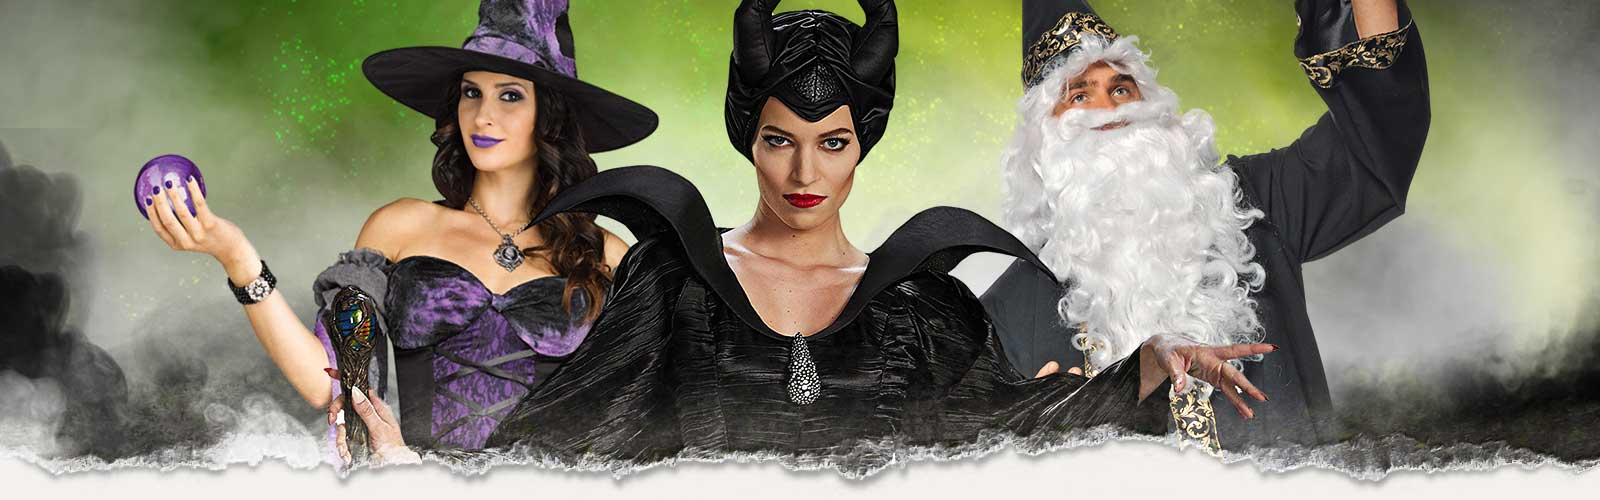 Hexen & Zauberer